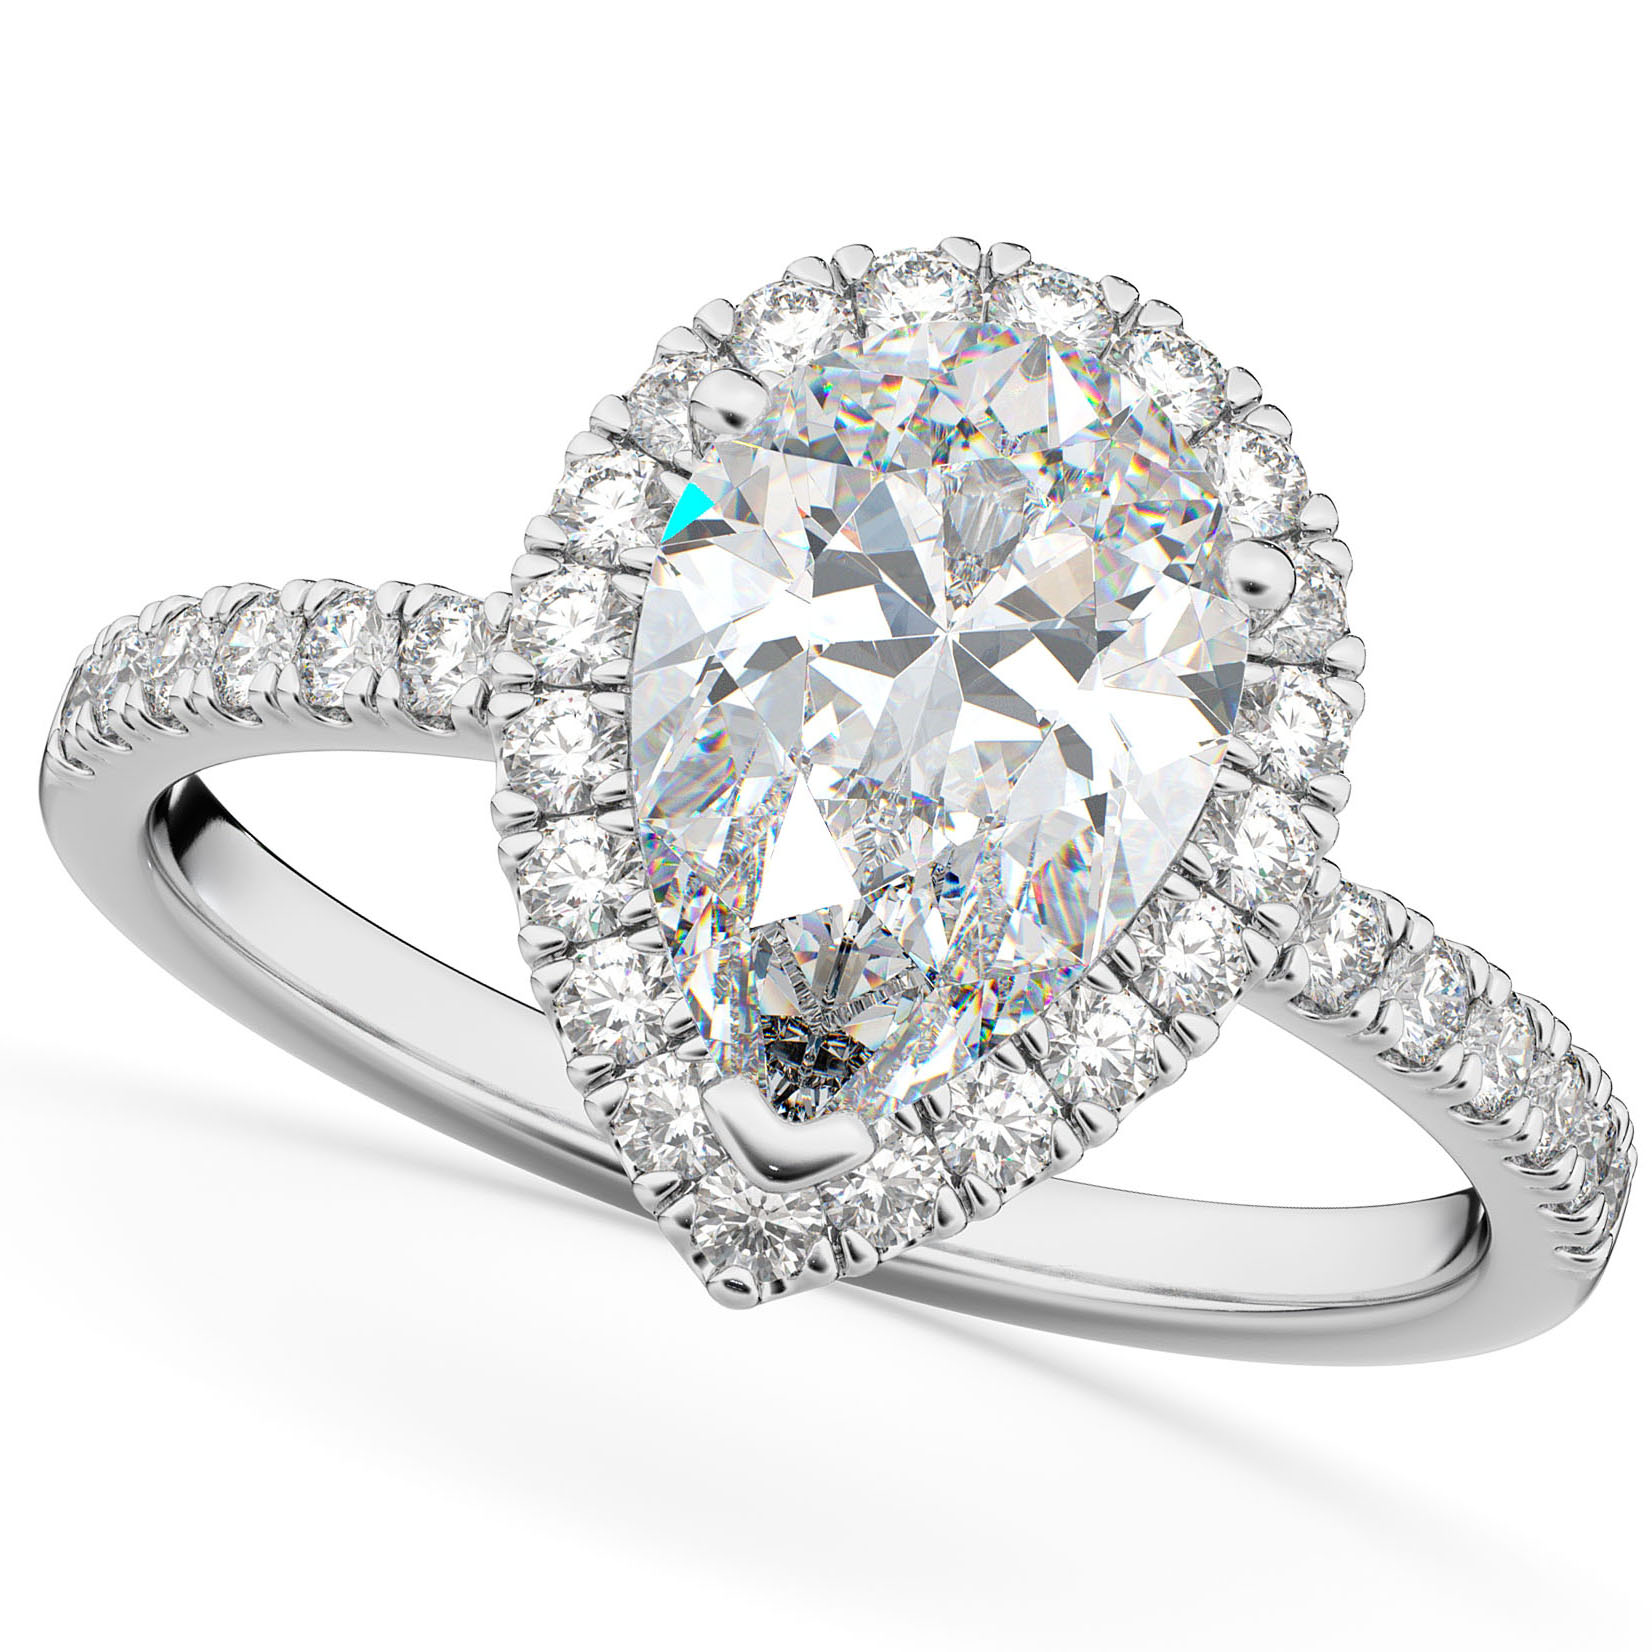 Pear Cut Halo Moissanite & Diamond Engagement Ring 14K White Gold 2.44ct